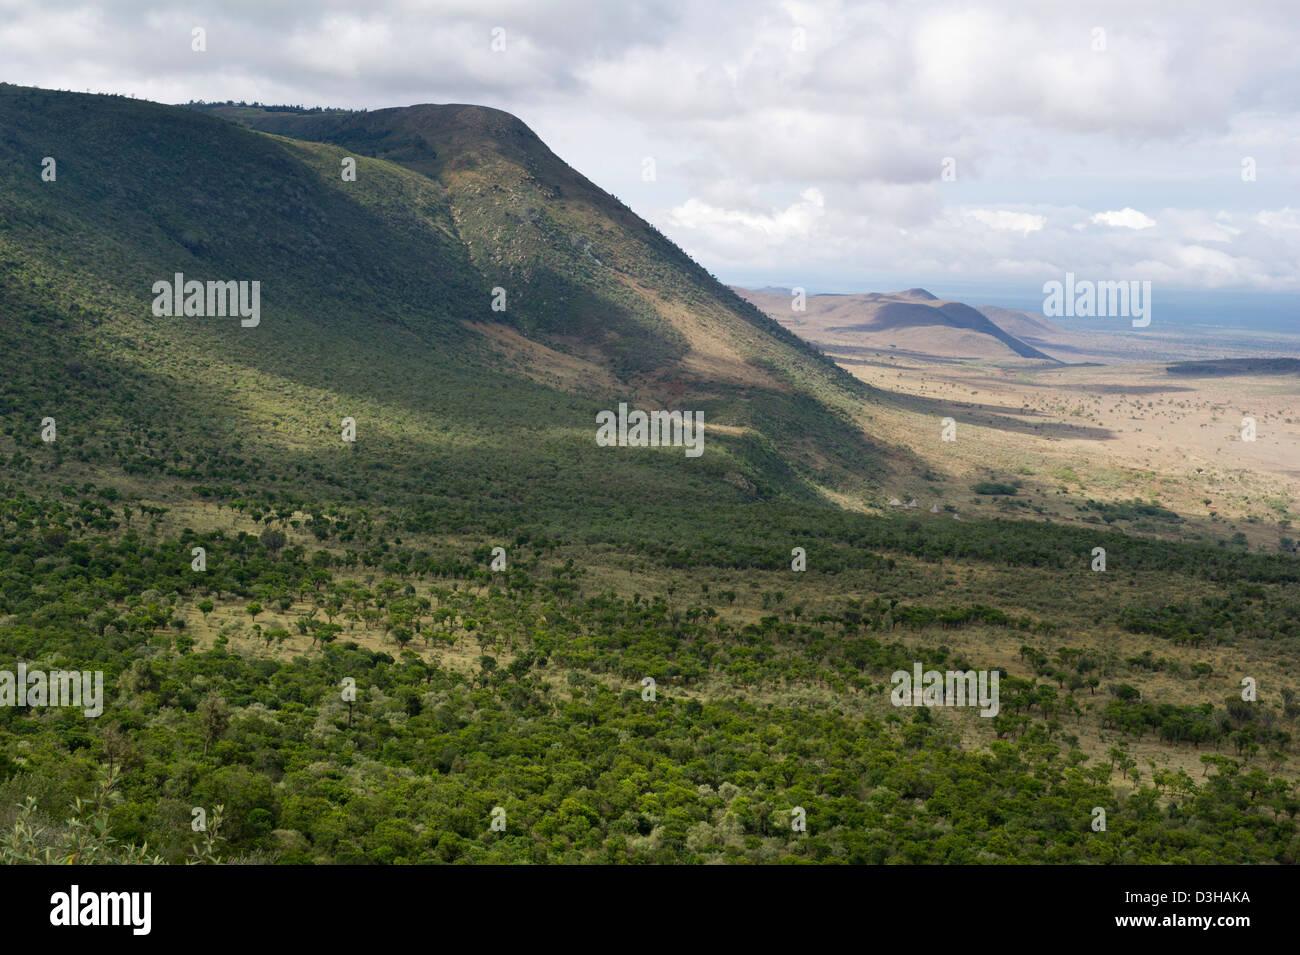 View of the Rift Valley escarpment on the Escarpment Road, Kenya Stock Photo